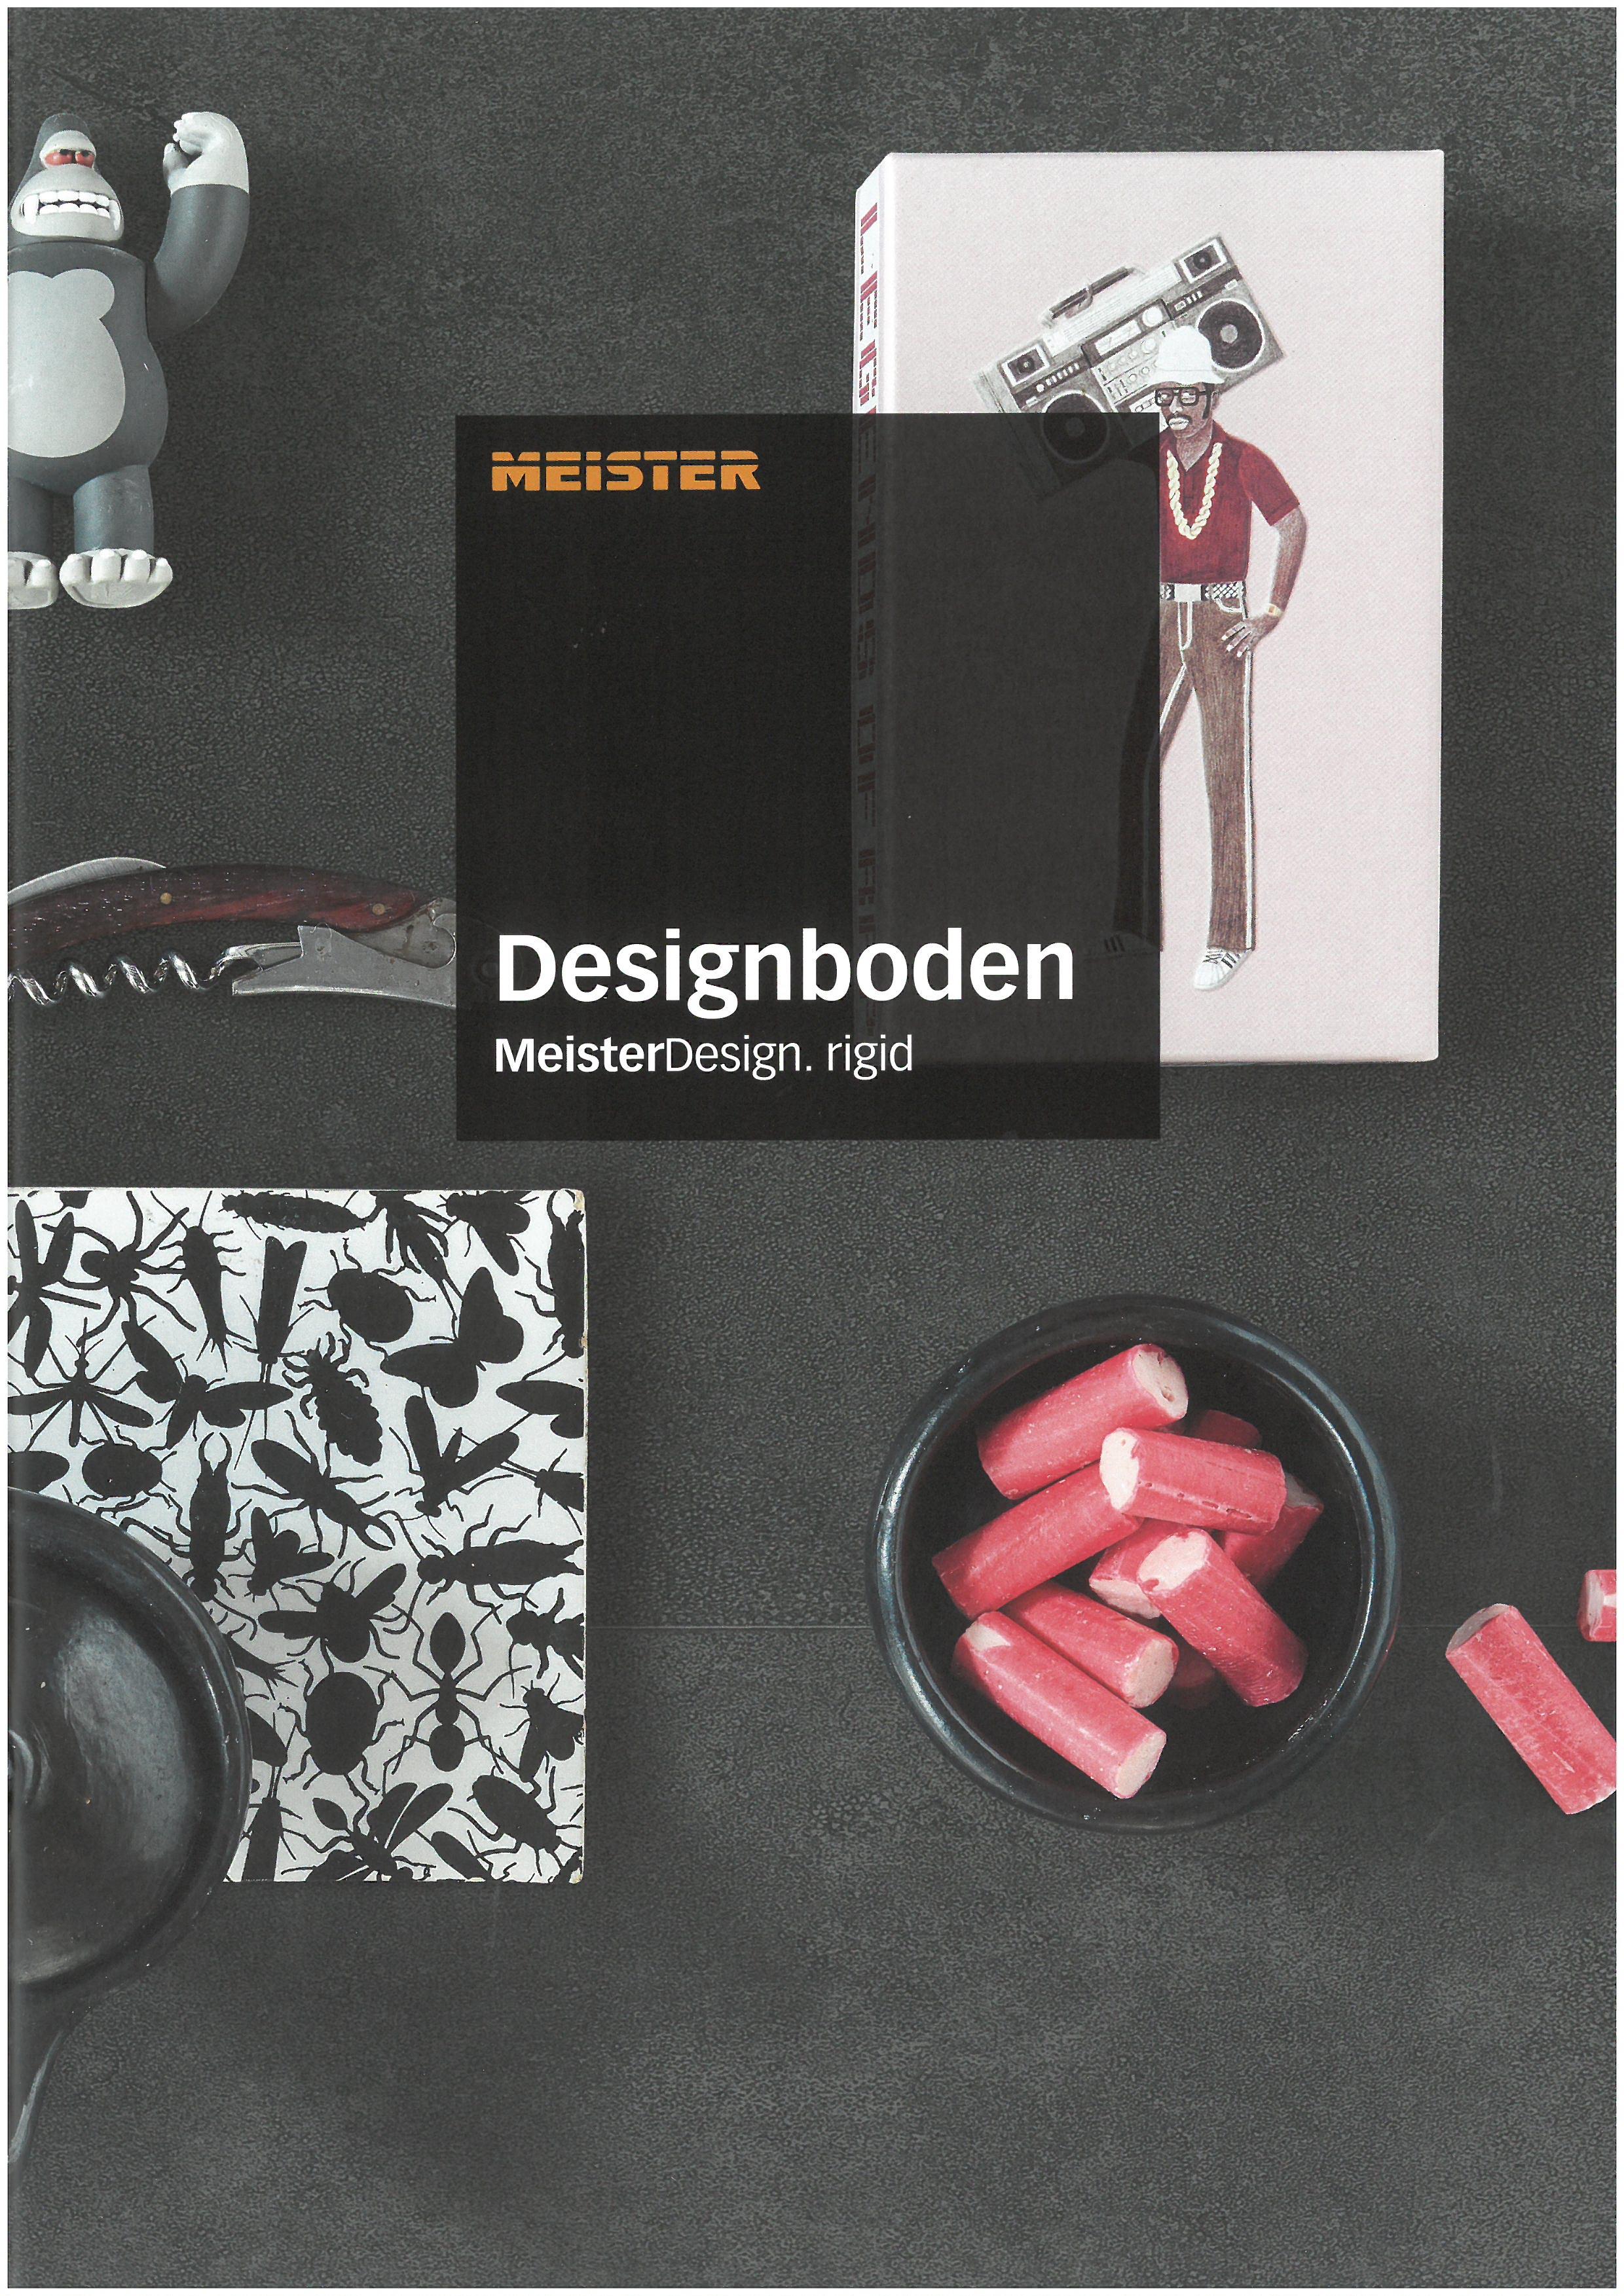 Designboden rigid